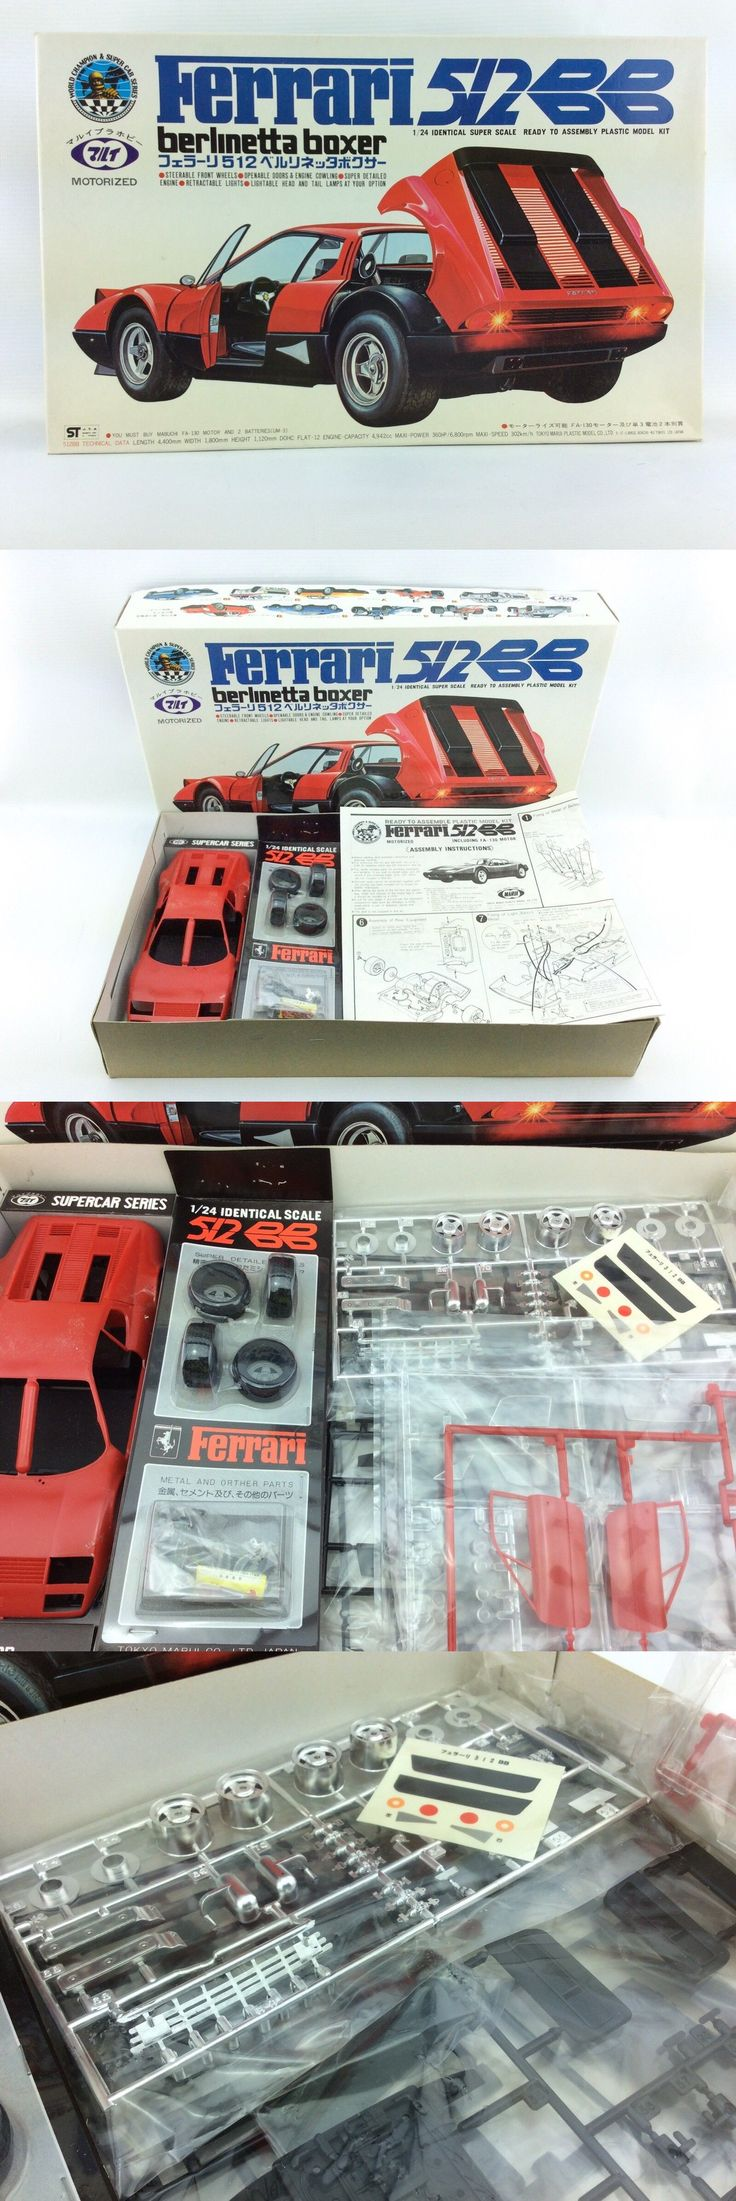 1 24 Scale 145974: New Nib Tokyo Marui Ferrari 512 Bb Berlinetta Boxer 1 24 Mt-77-S12-800 Tilt -> BUY IT NOW ONLY: $89 on eBay!